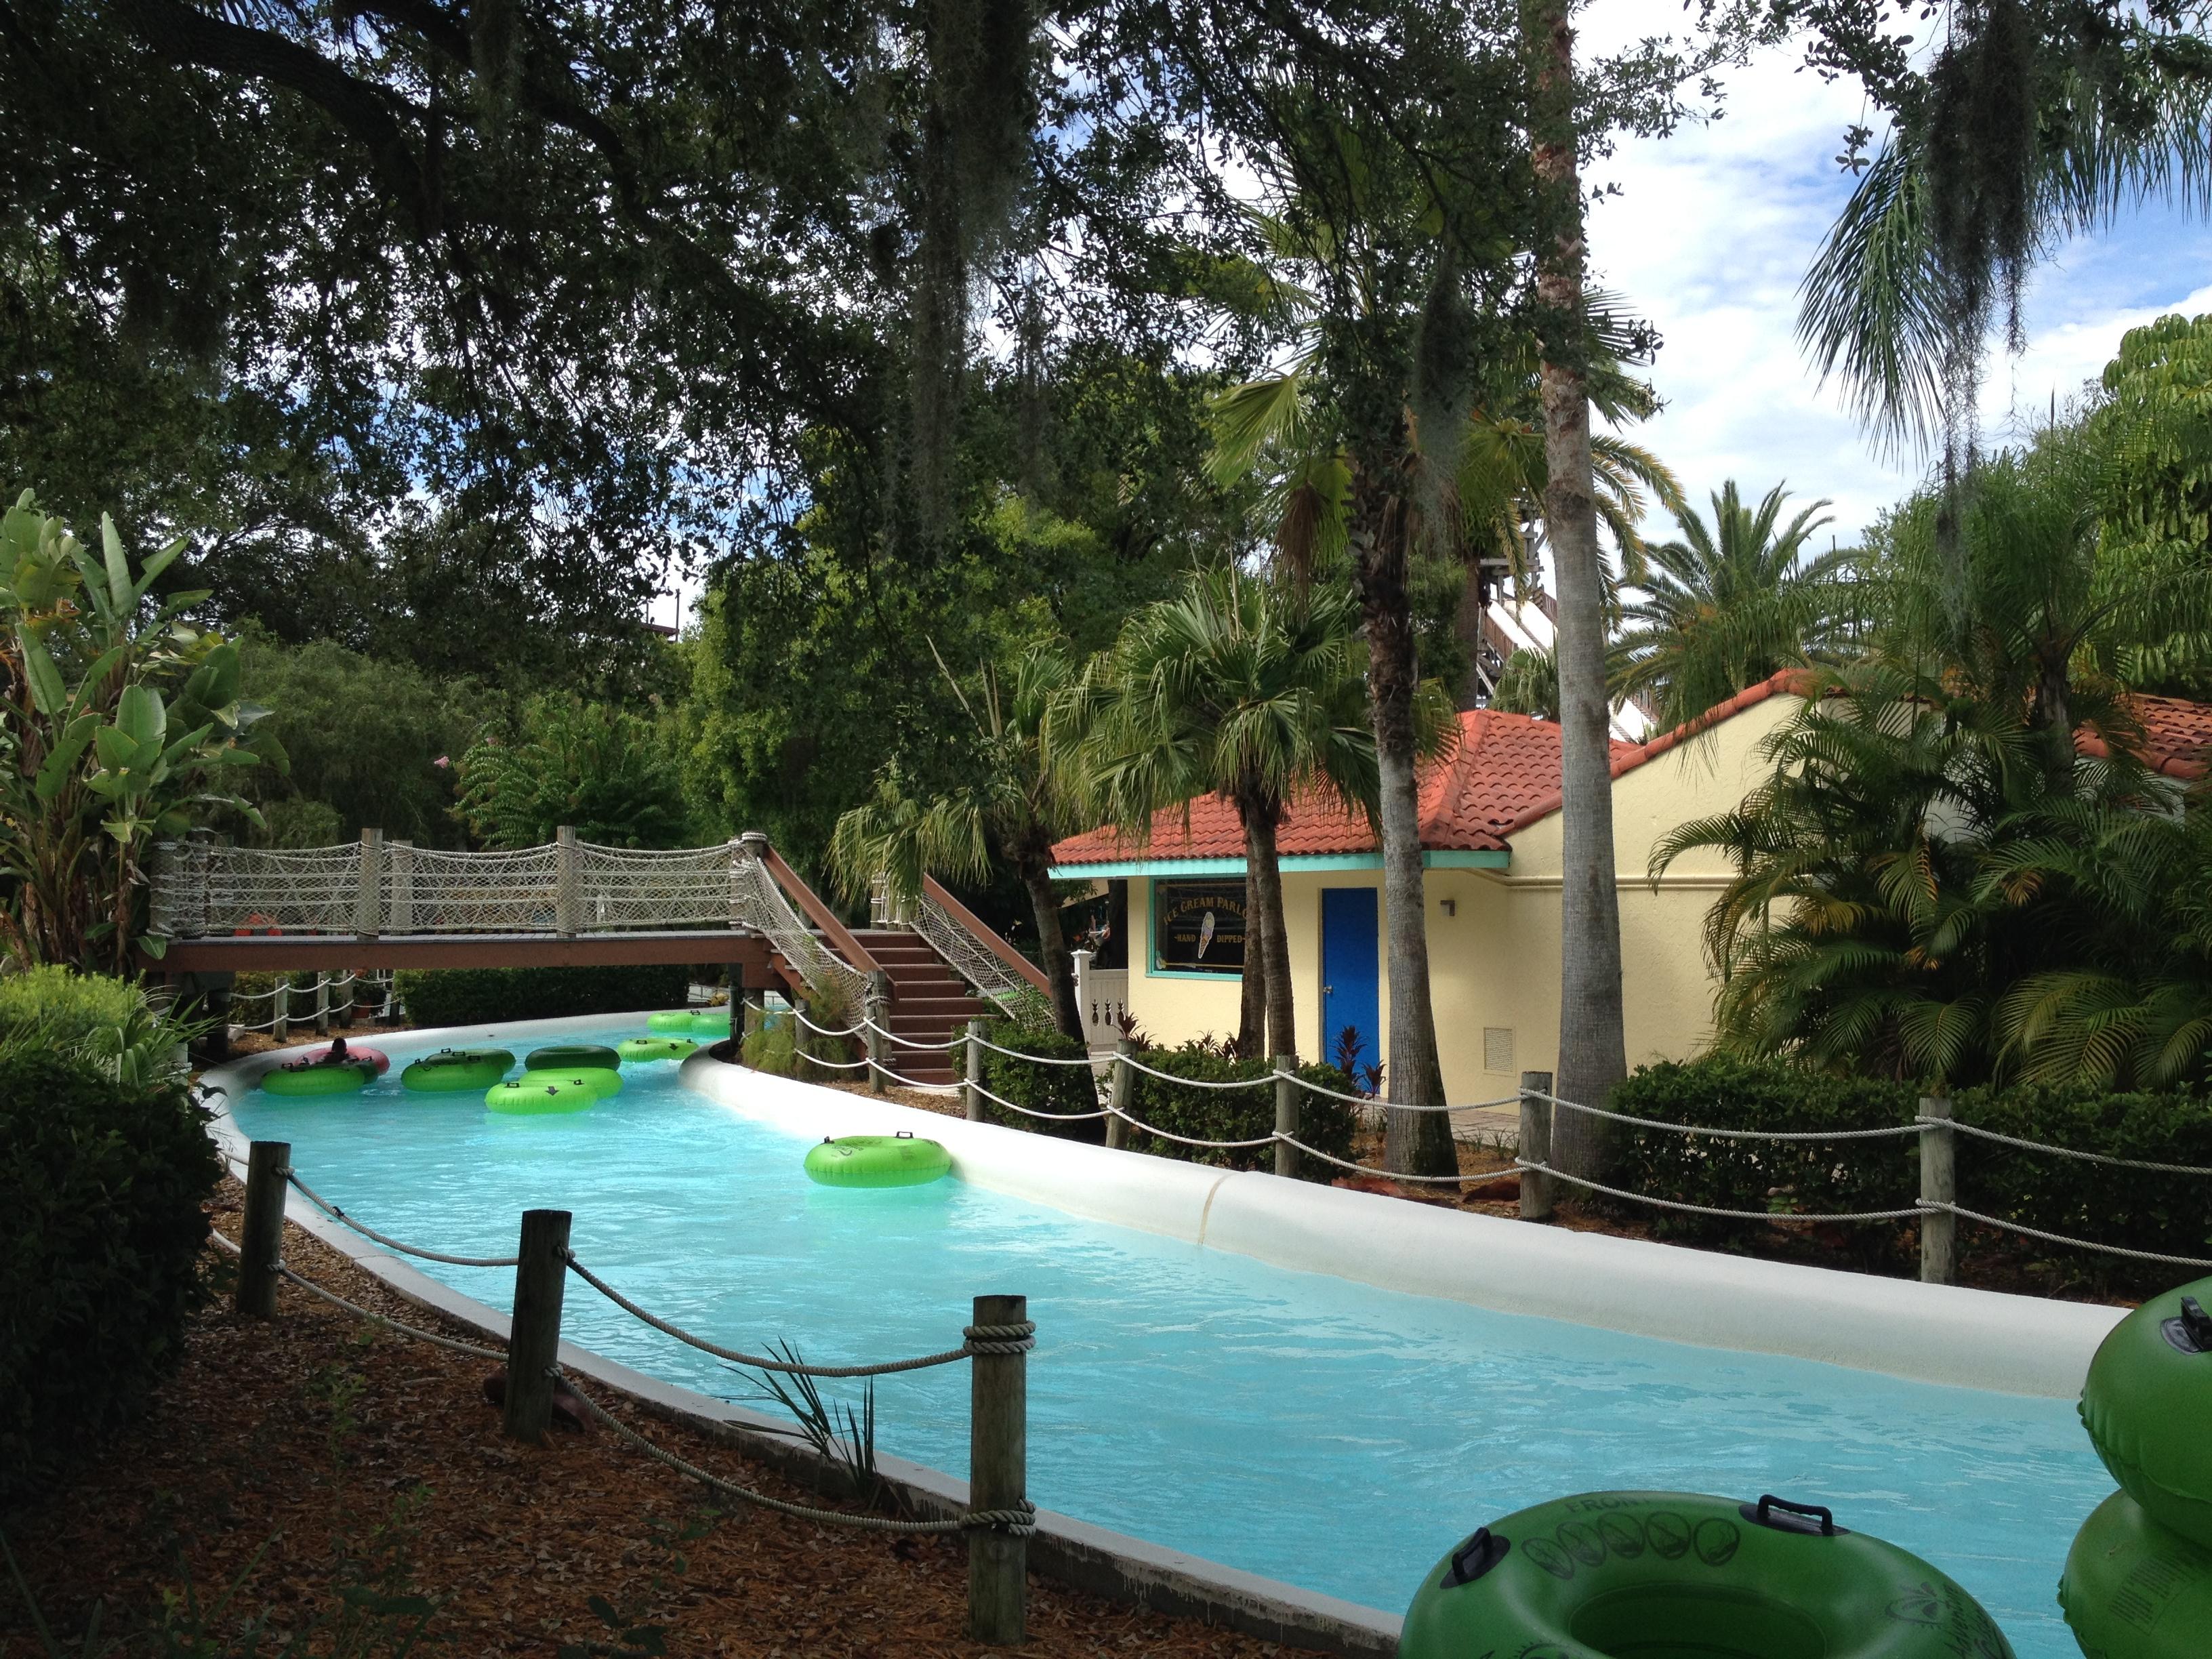 Adventure Island Tampa: Get To Adventure Island